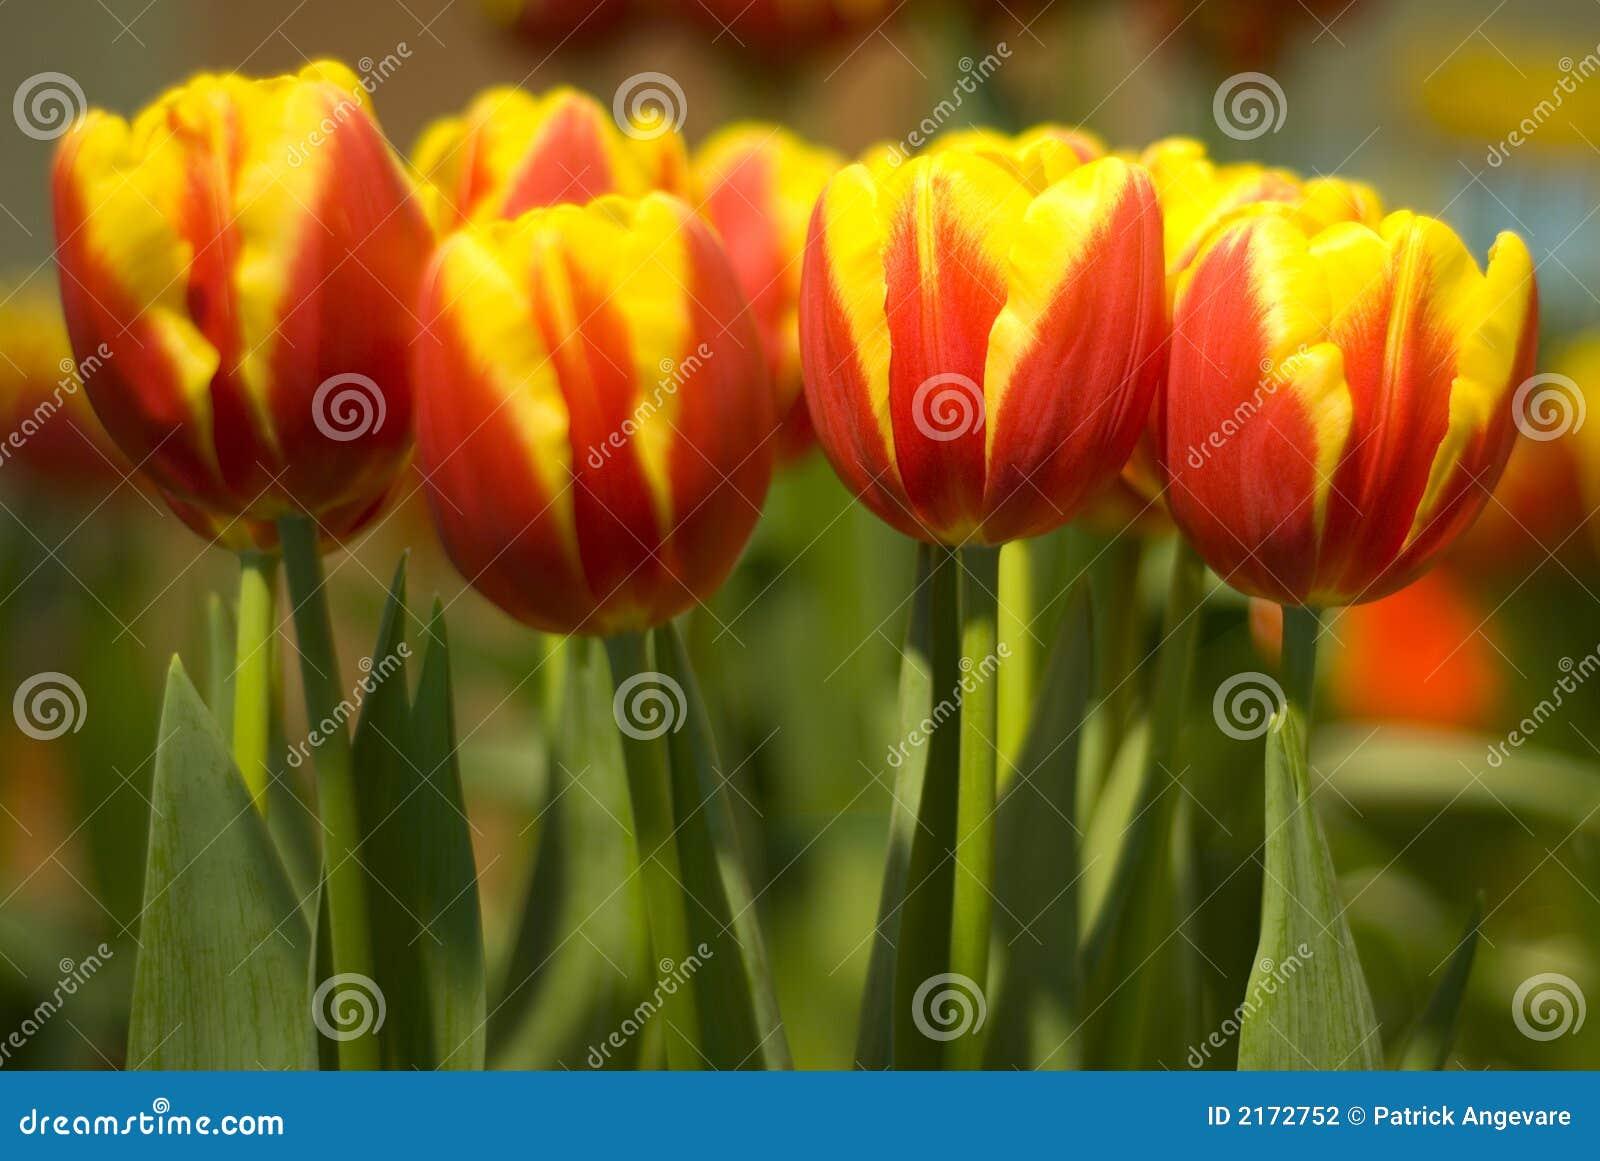 Tulipanes amarillo naranja - Amarillo naranja ...